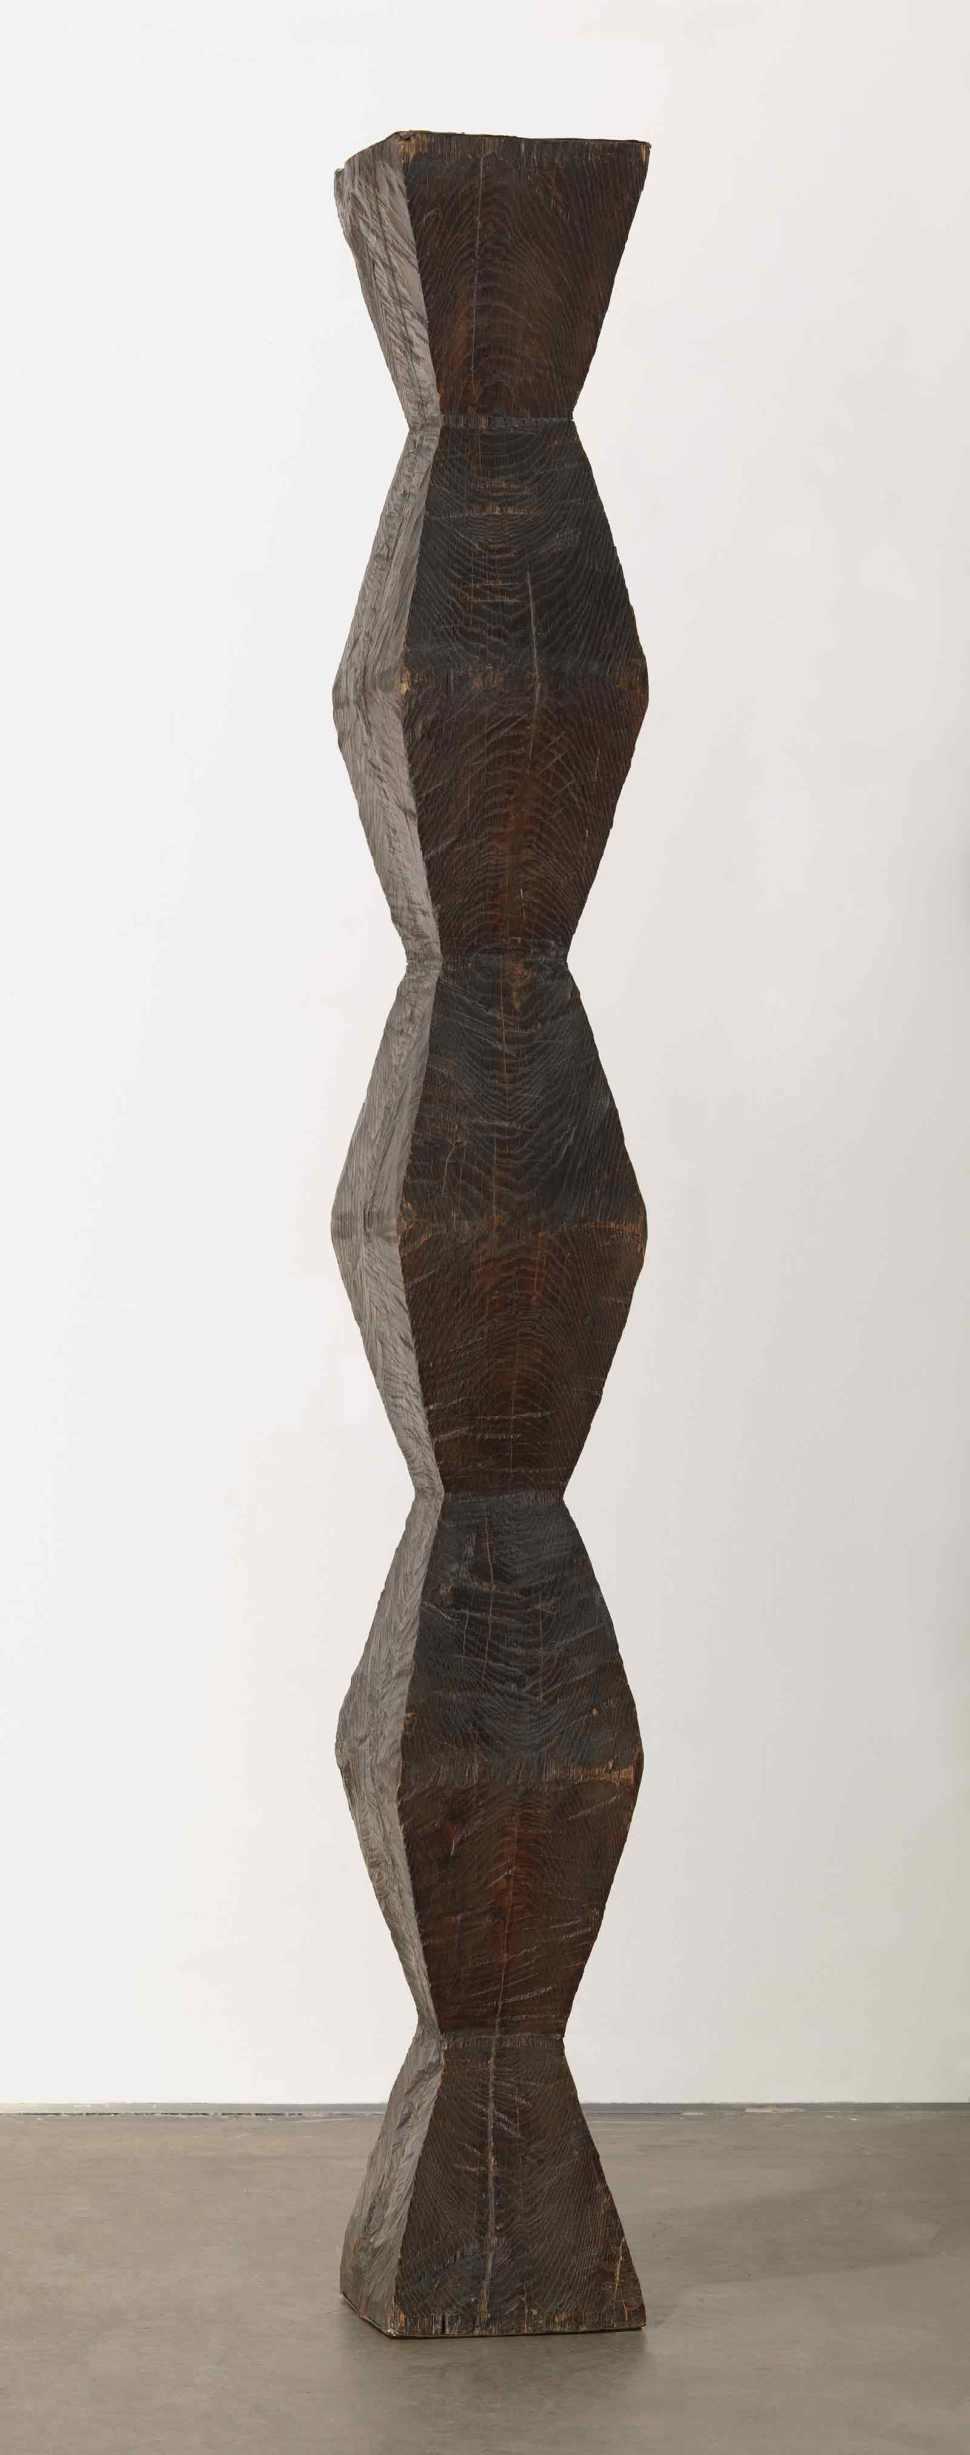 Constantin Brancusi, Endless Column